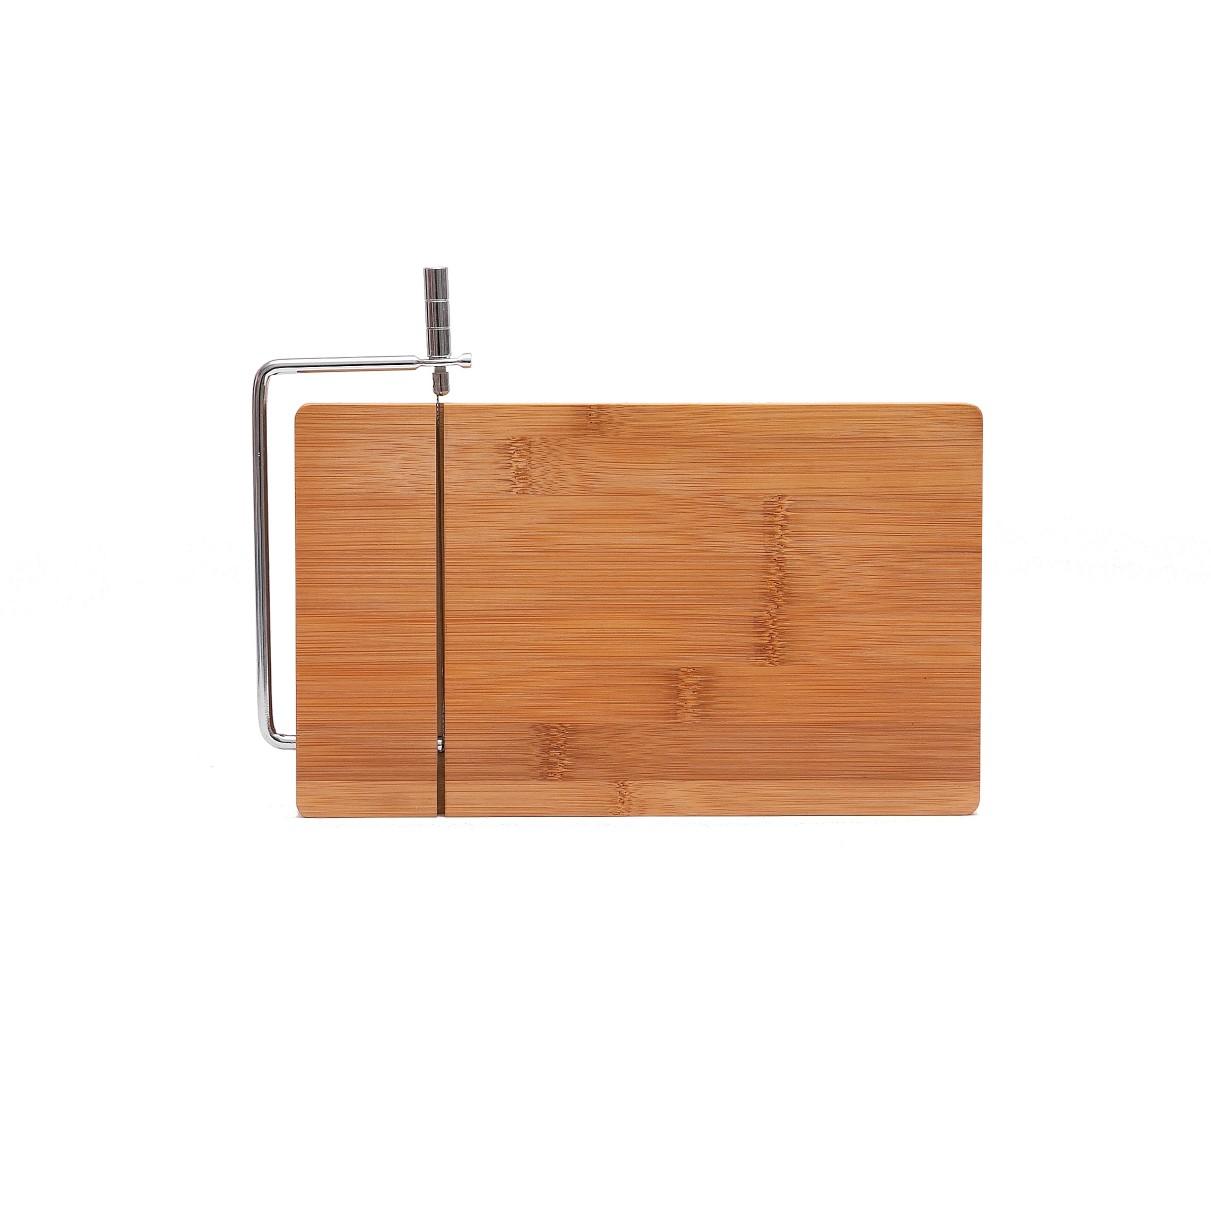 Tabua de Frios Retangular Bambu 26x16cm - Bianchini